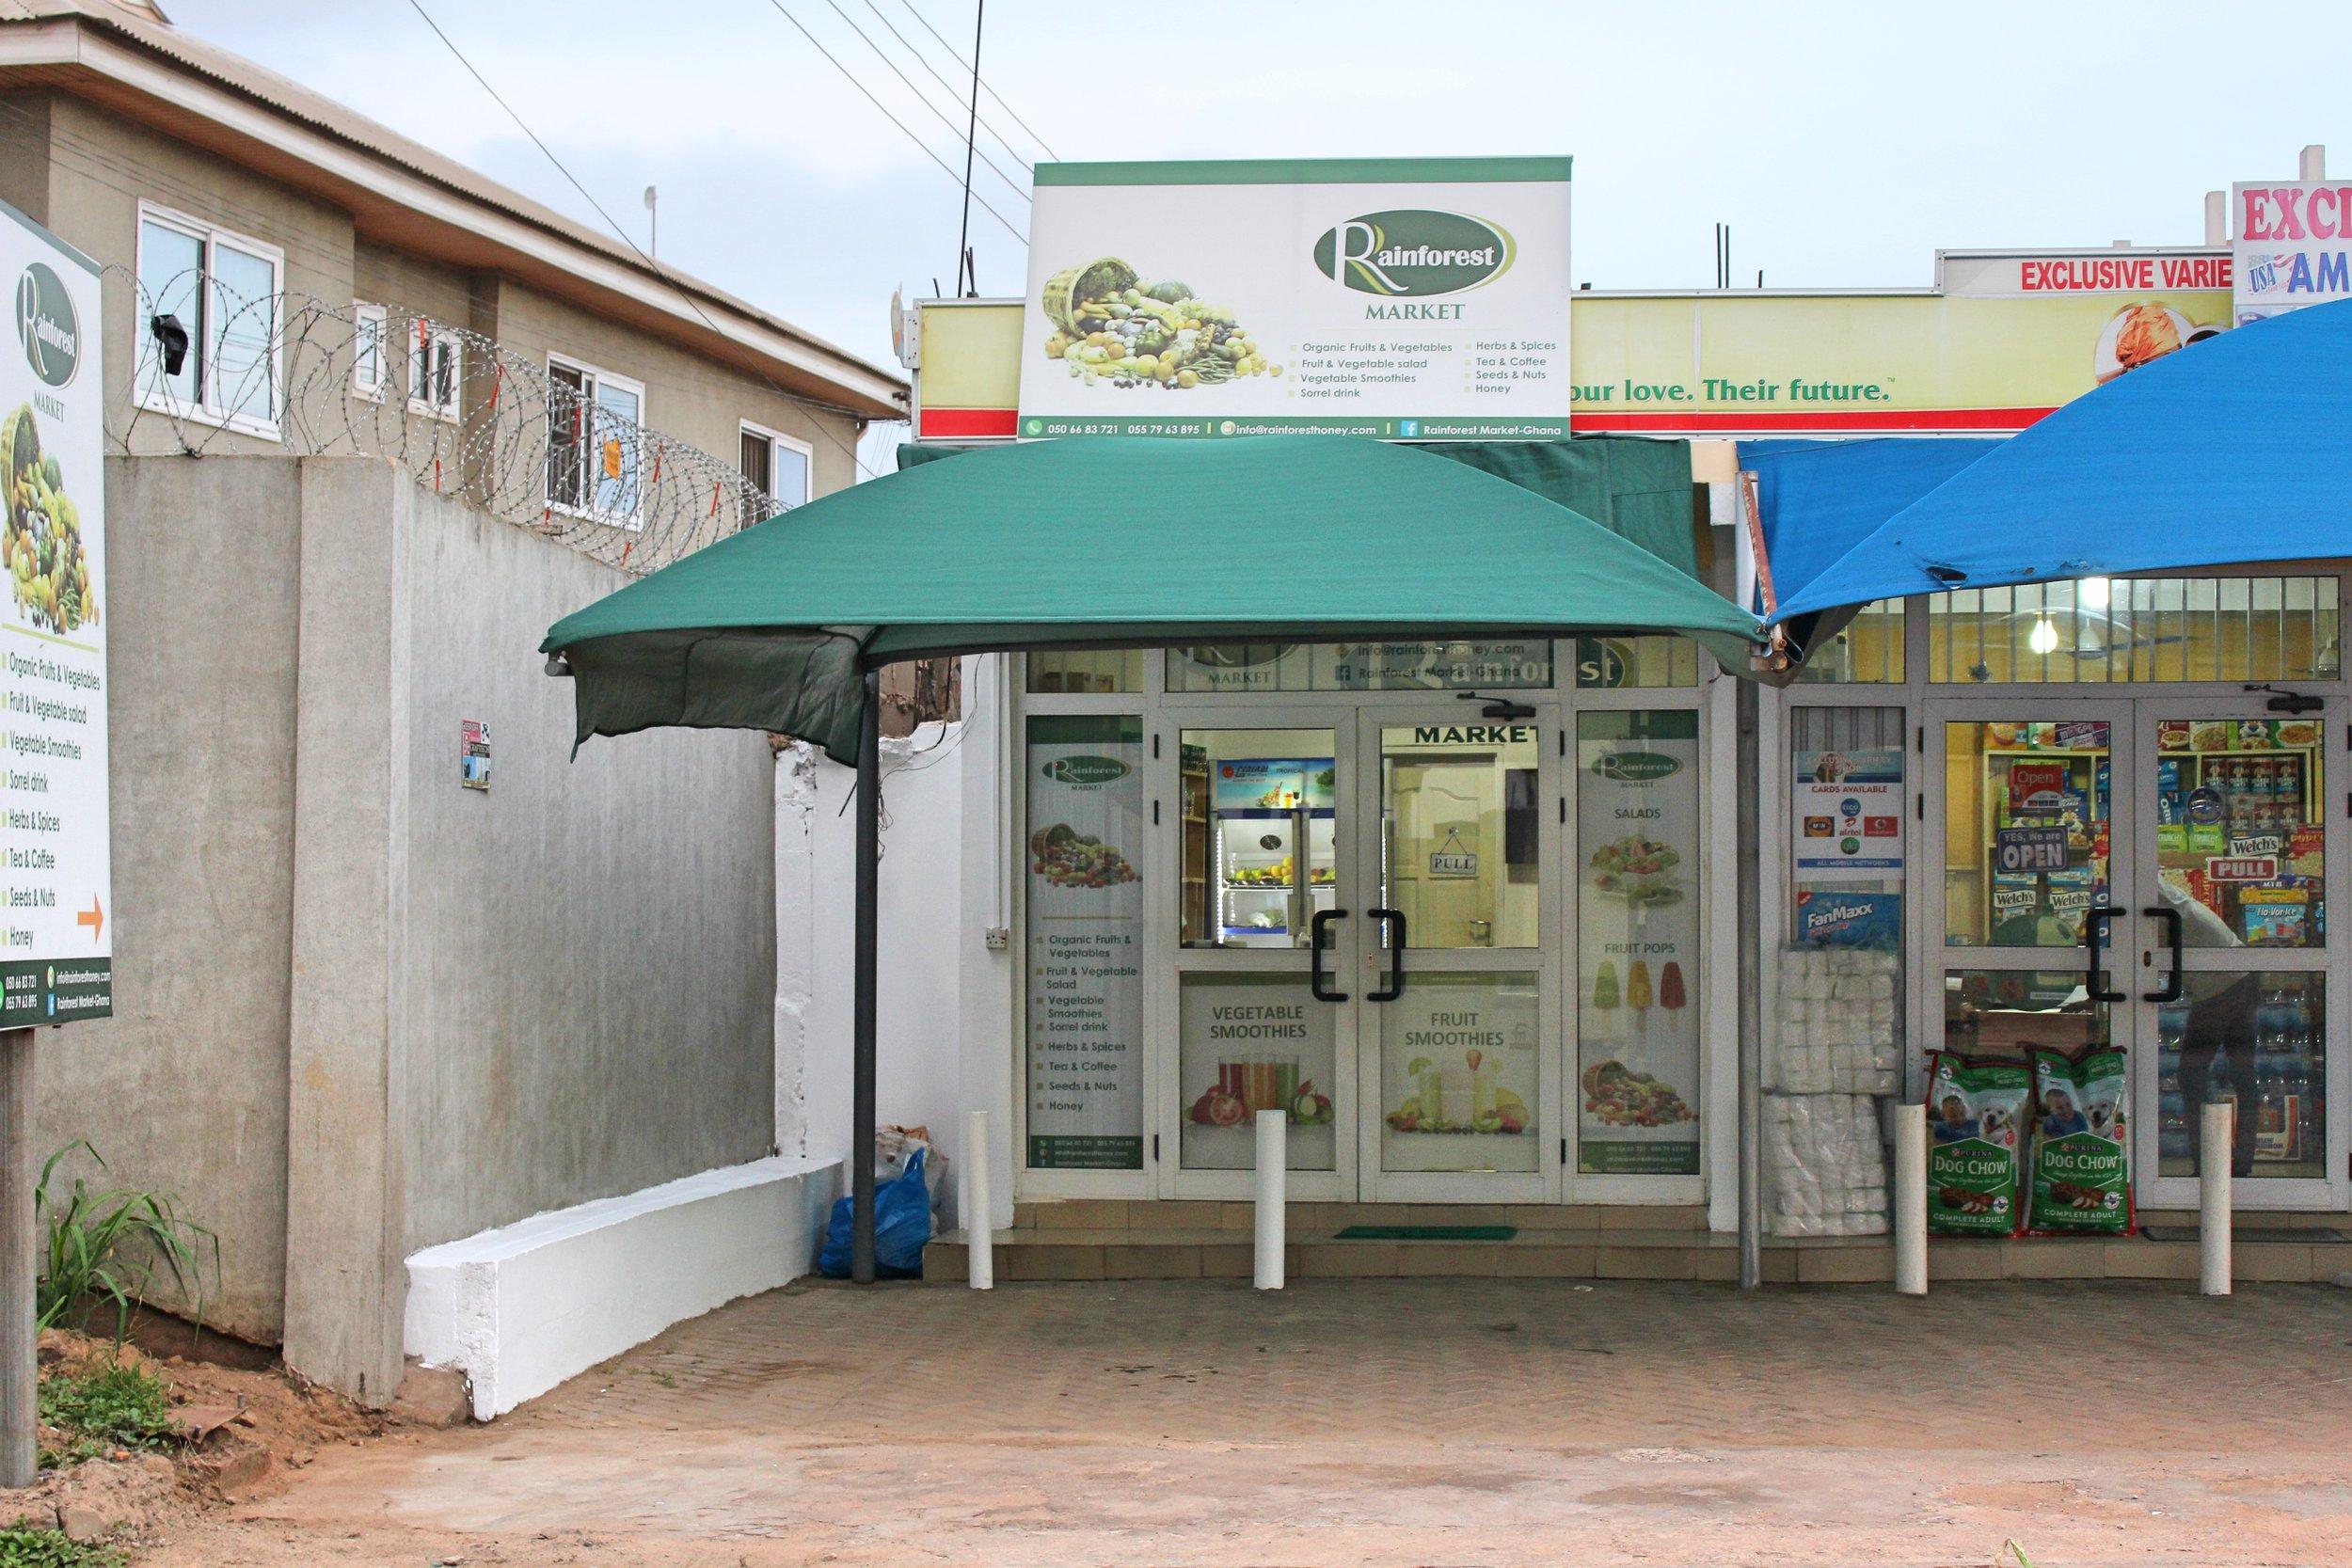 Rainforest Market  Garden Avenue, East Legon  026 552 9505